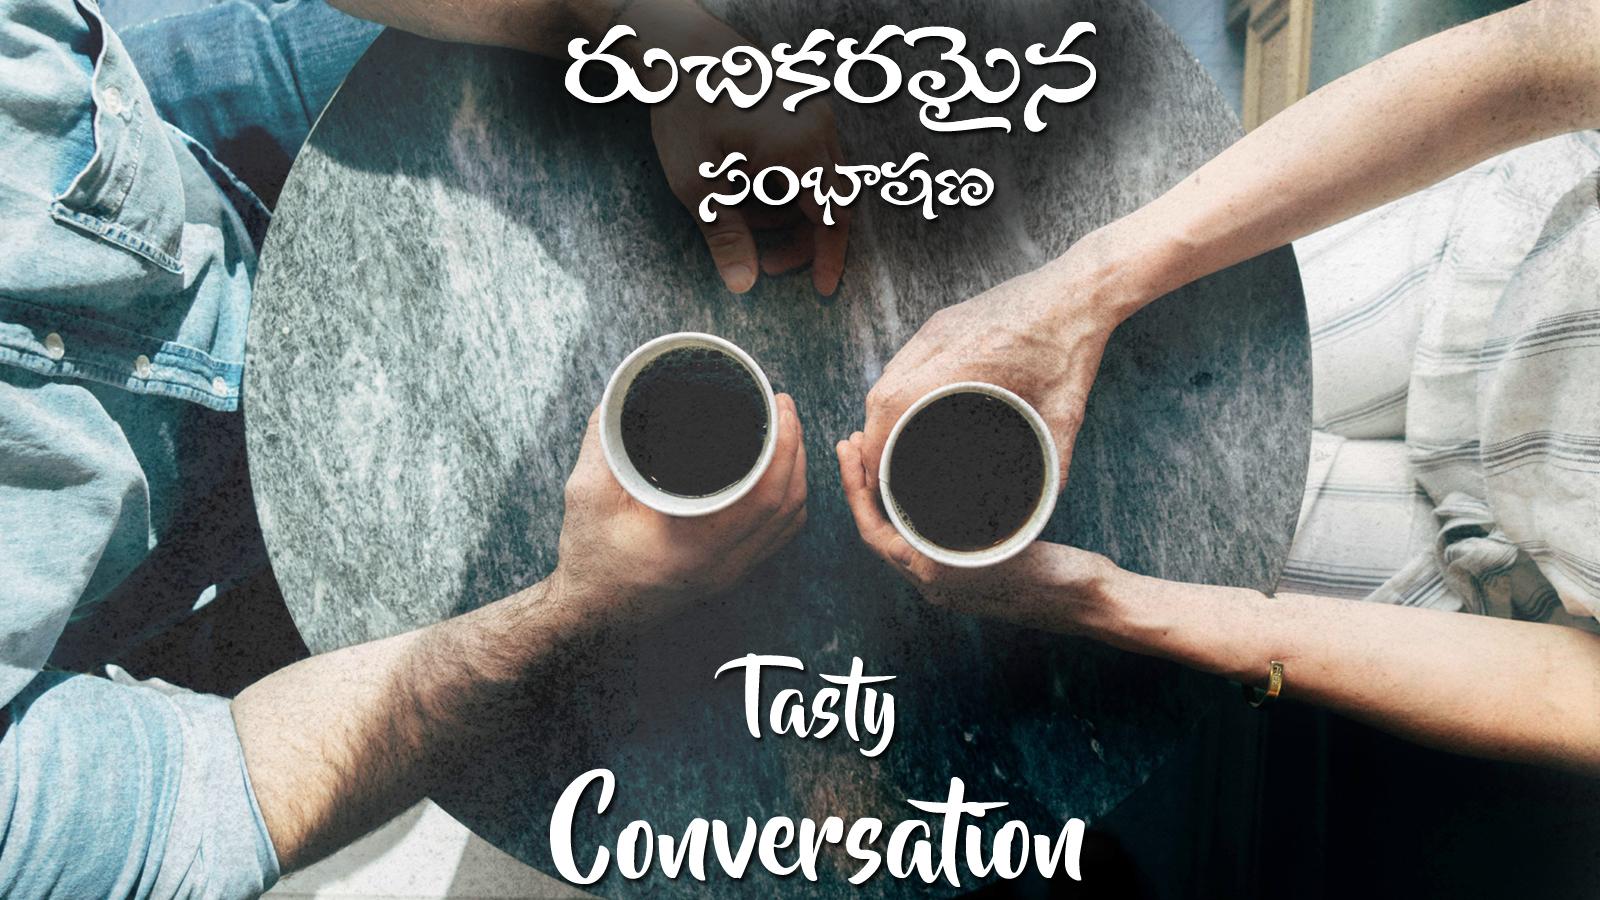 Tasty Conversation (A277)